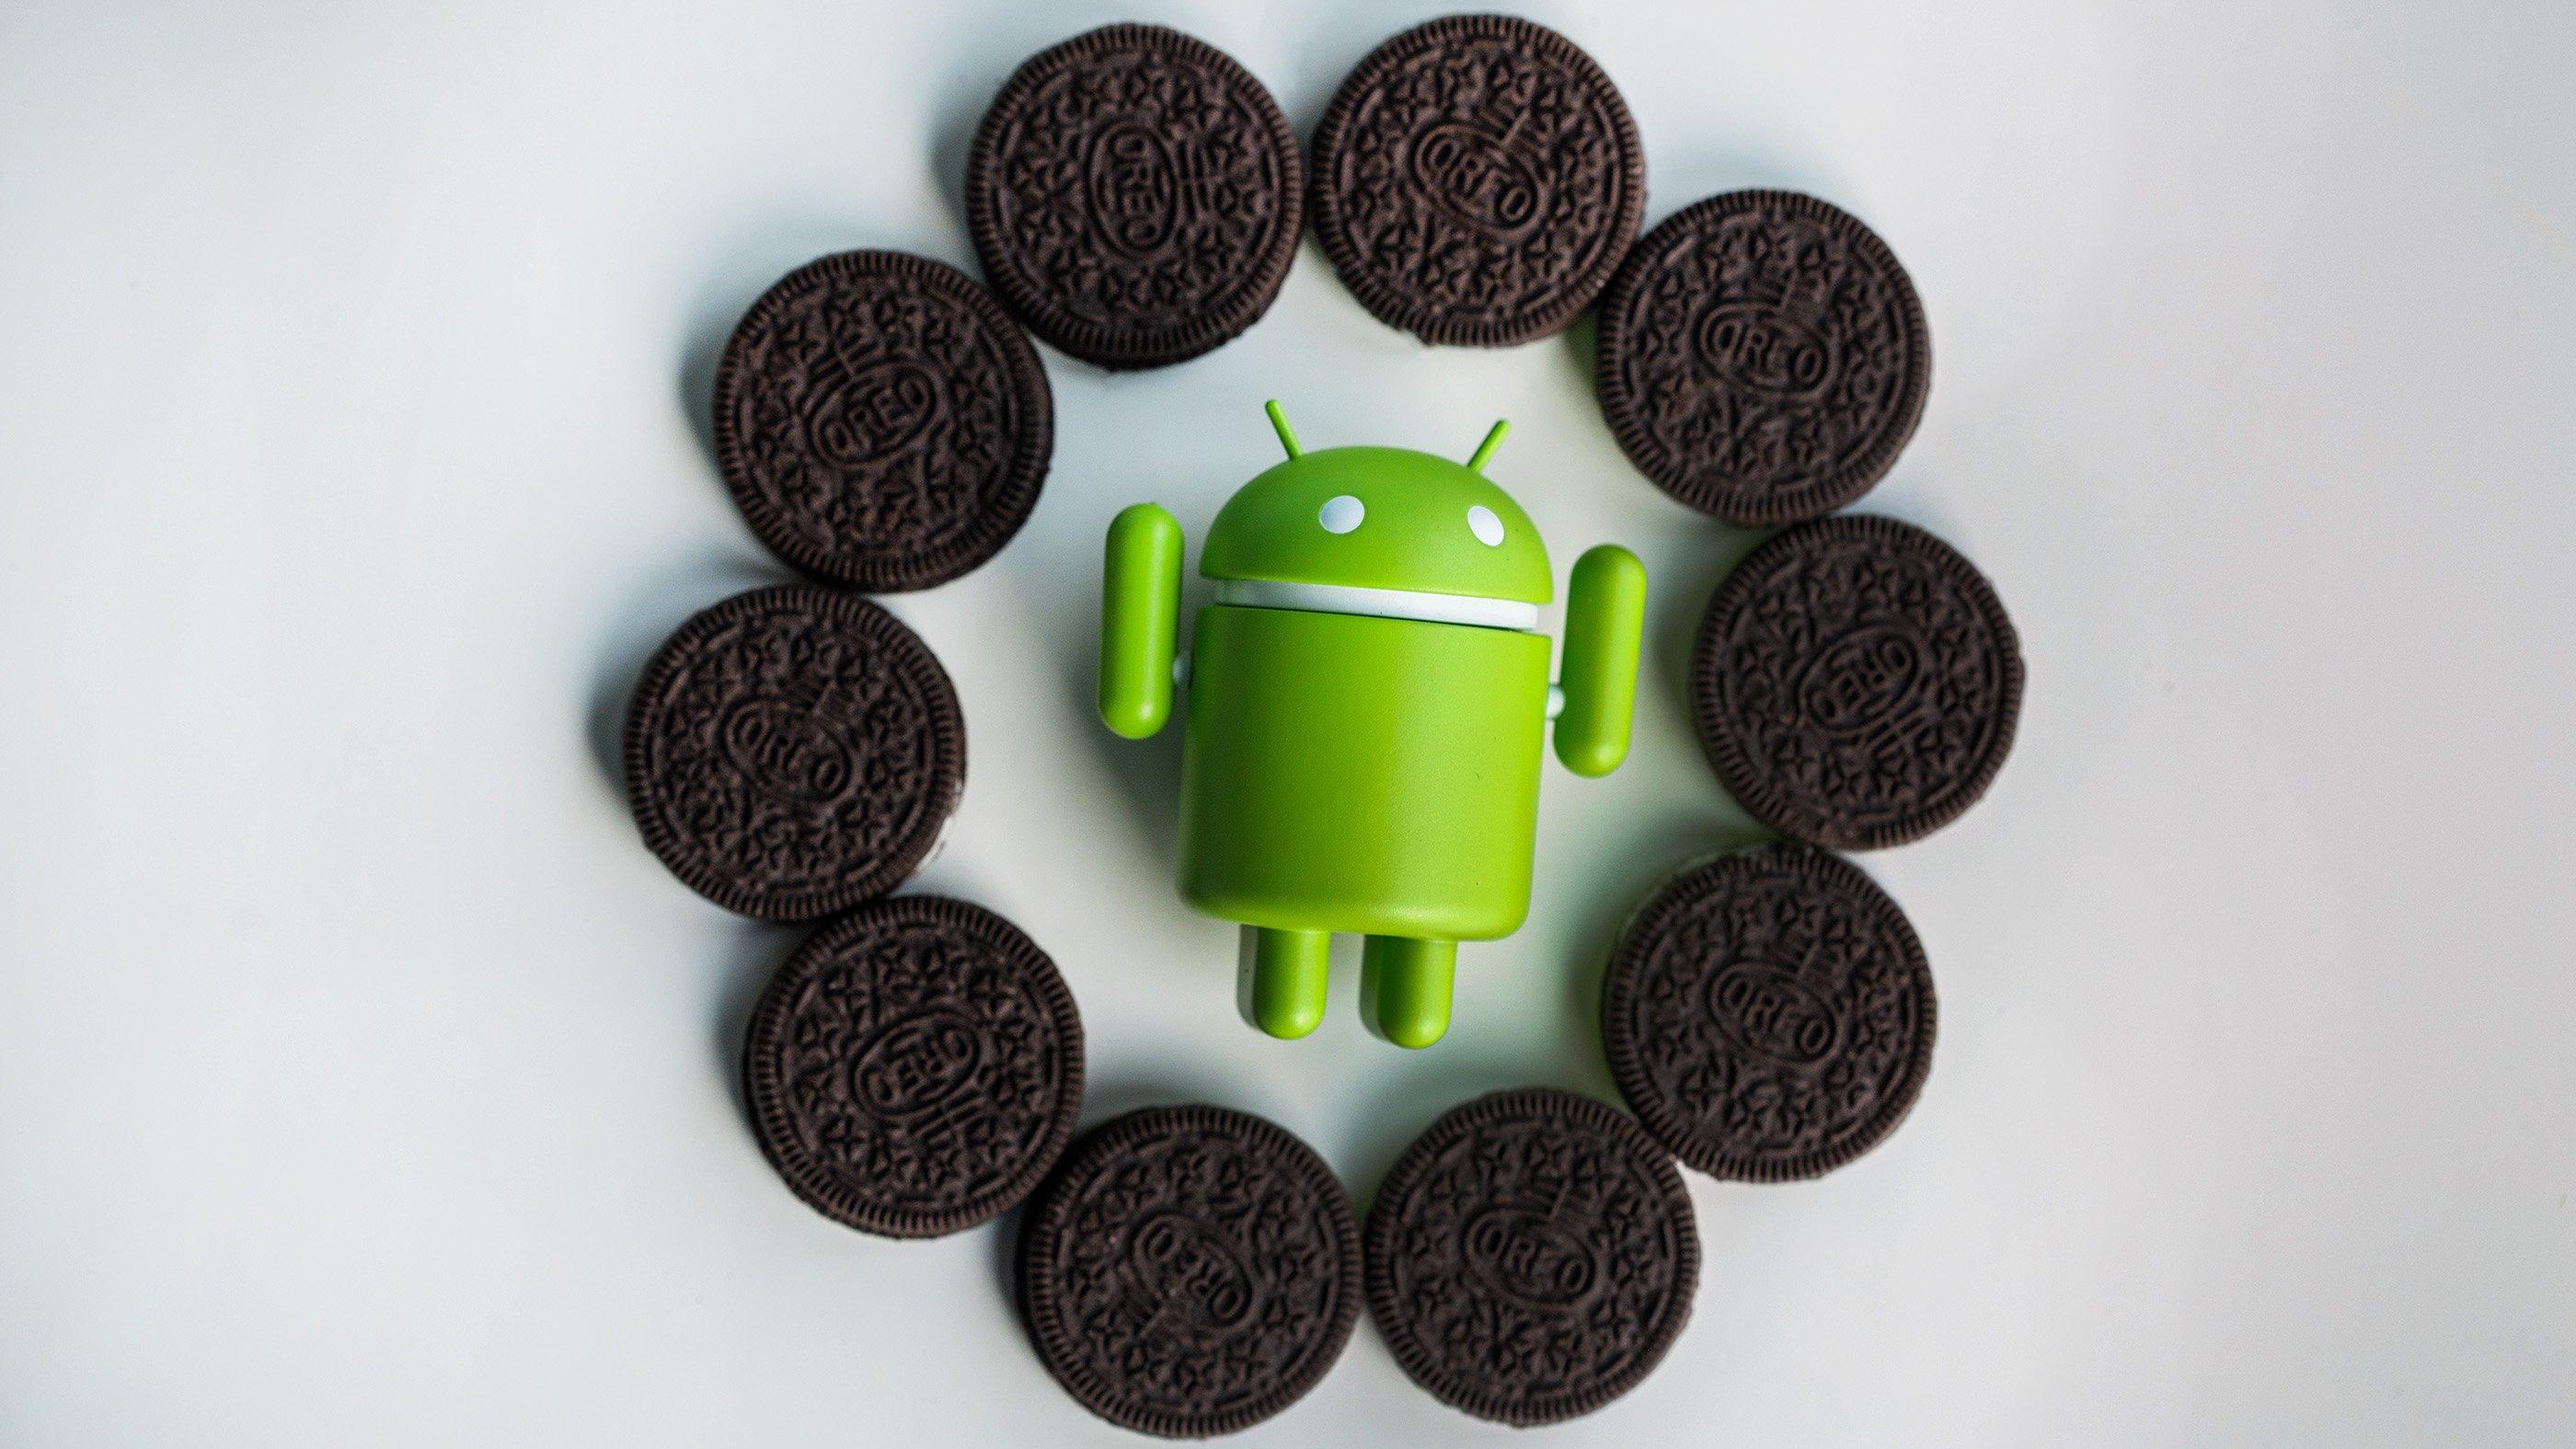 Nowy problem z Androidem Oreo. Mo¿e sprawiæ, ¿e telefon sam siê restartuje